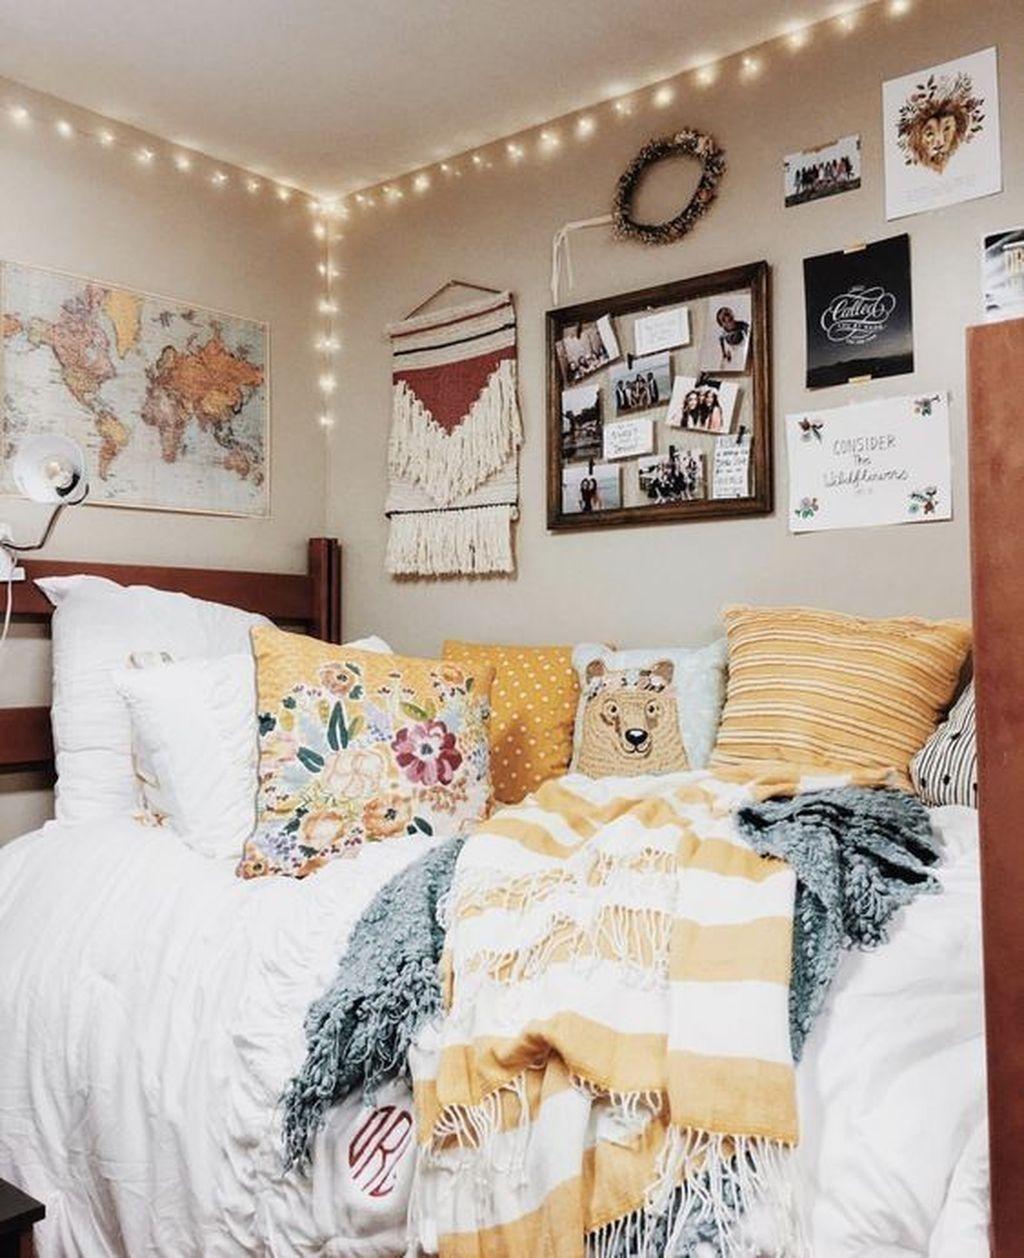 Dorm Room Ideas To Tare Decor